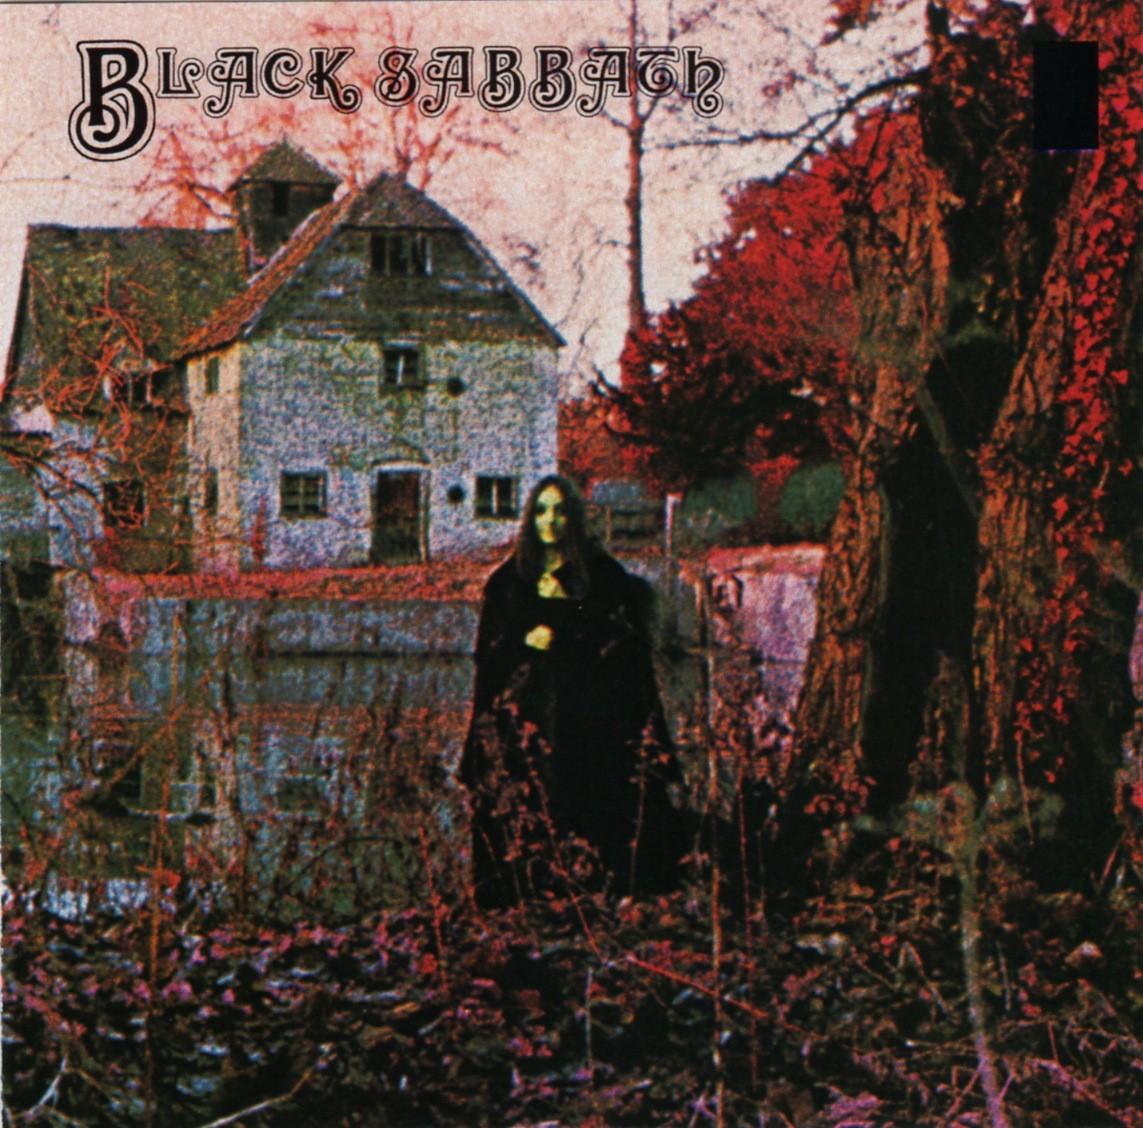 The Black Box Beatles Megaupload 89